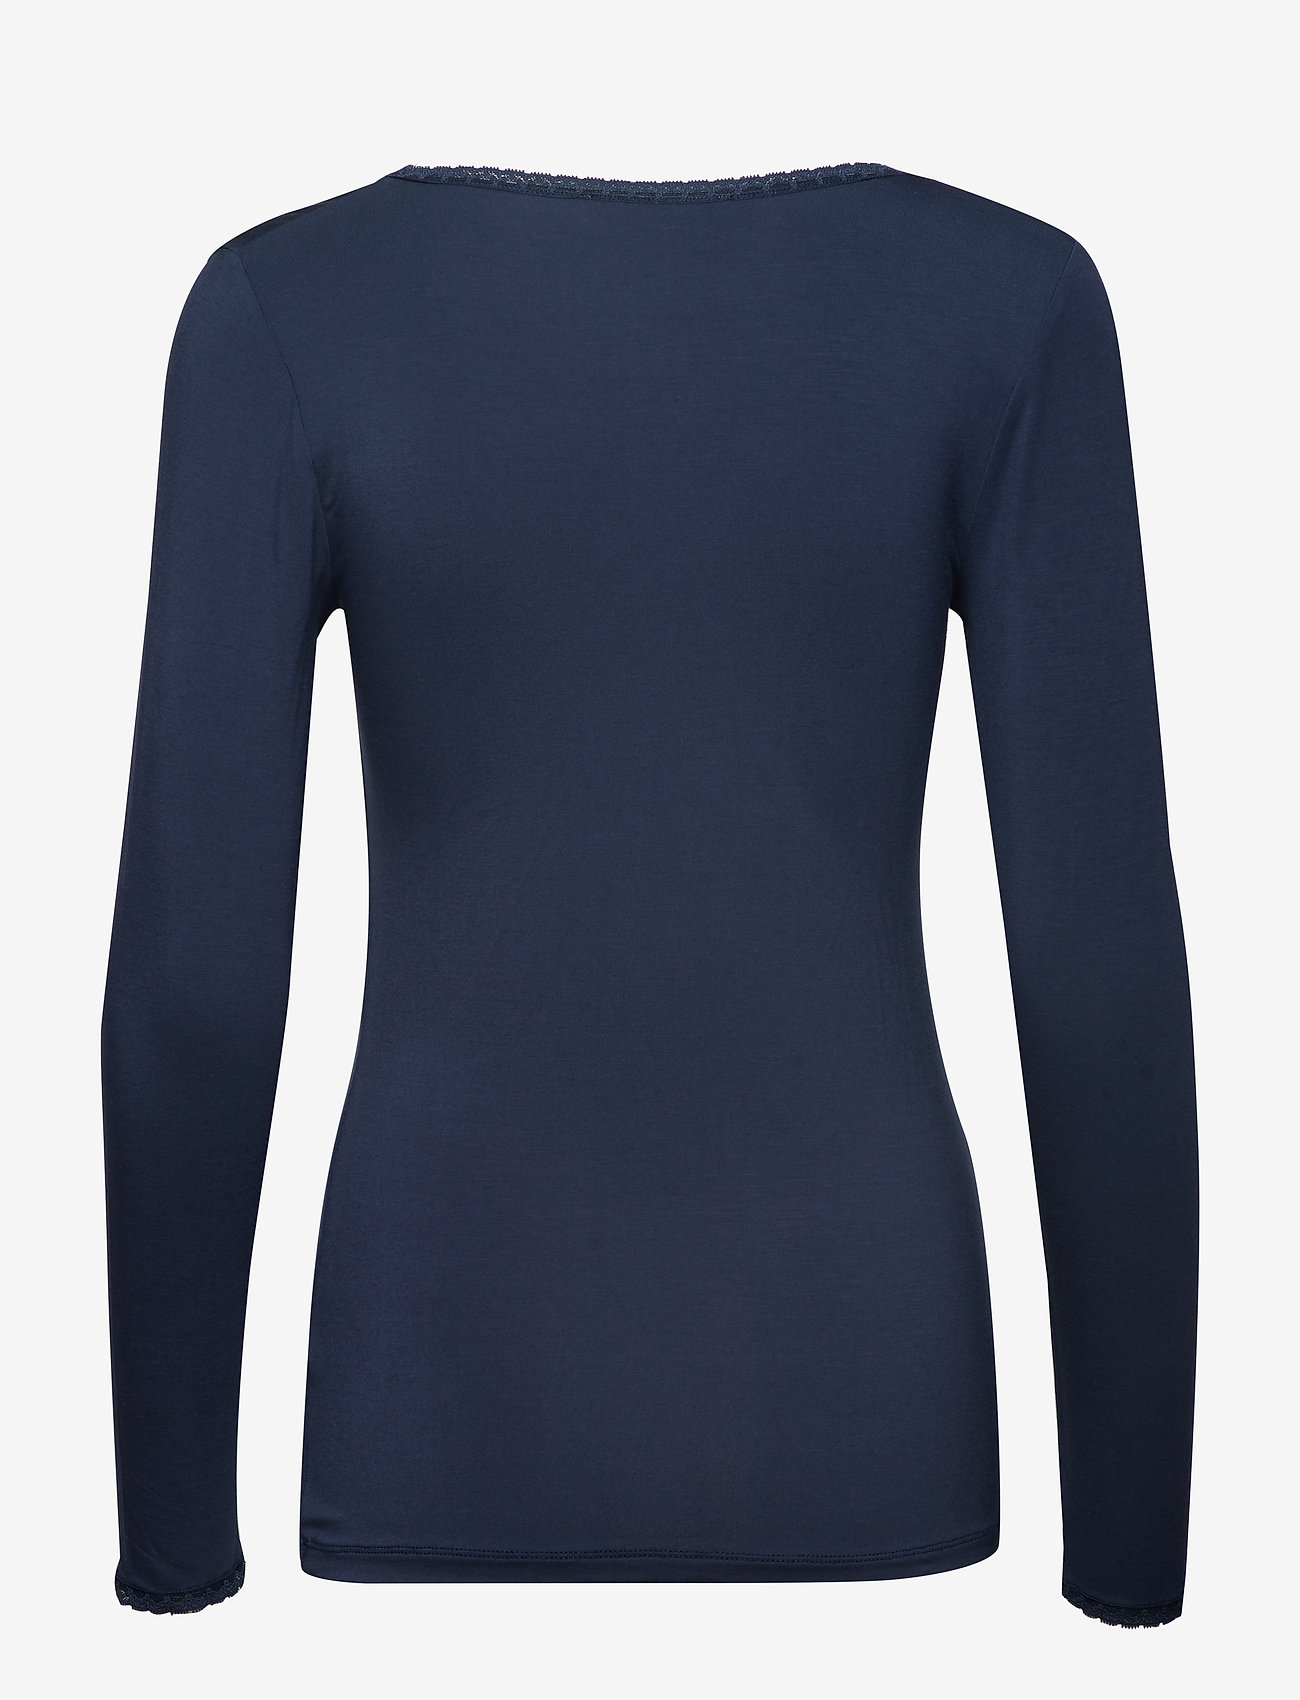 Noa Noa - T-shirt - tops met lange mouwen - dress blues - 1